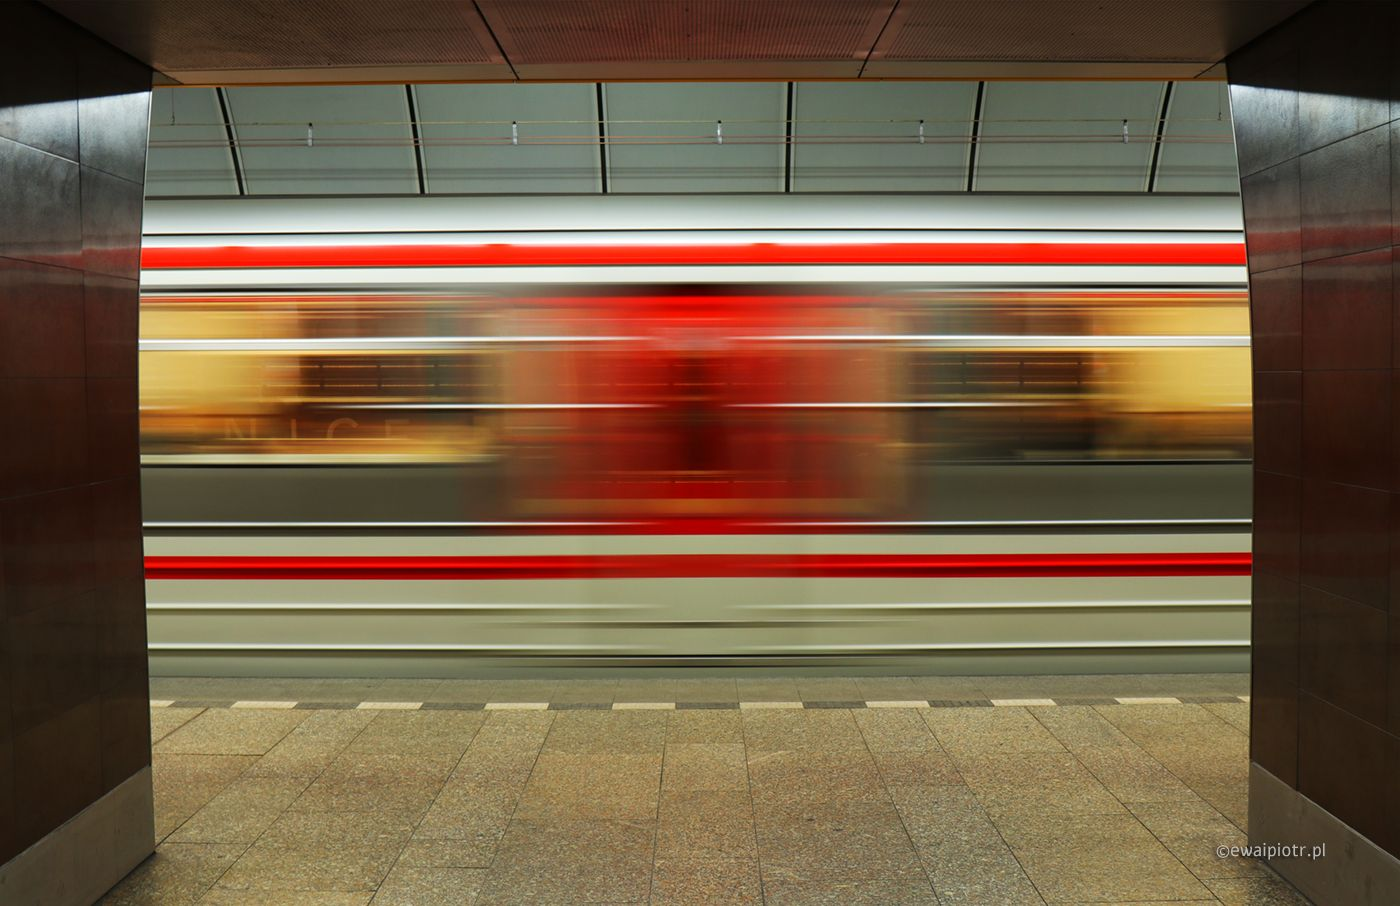 Praskie metro - pociąg jedzie